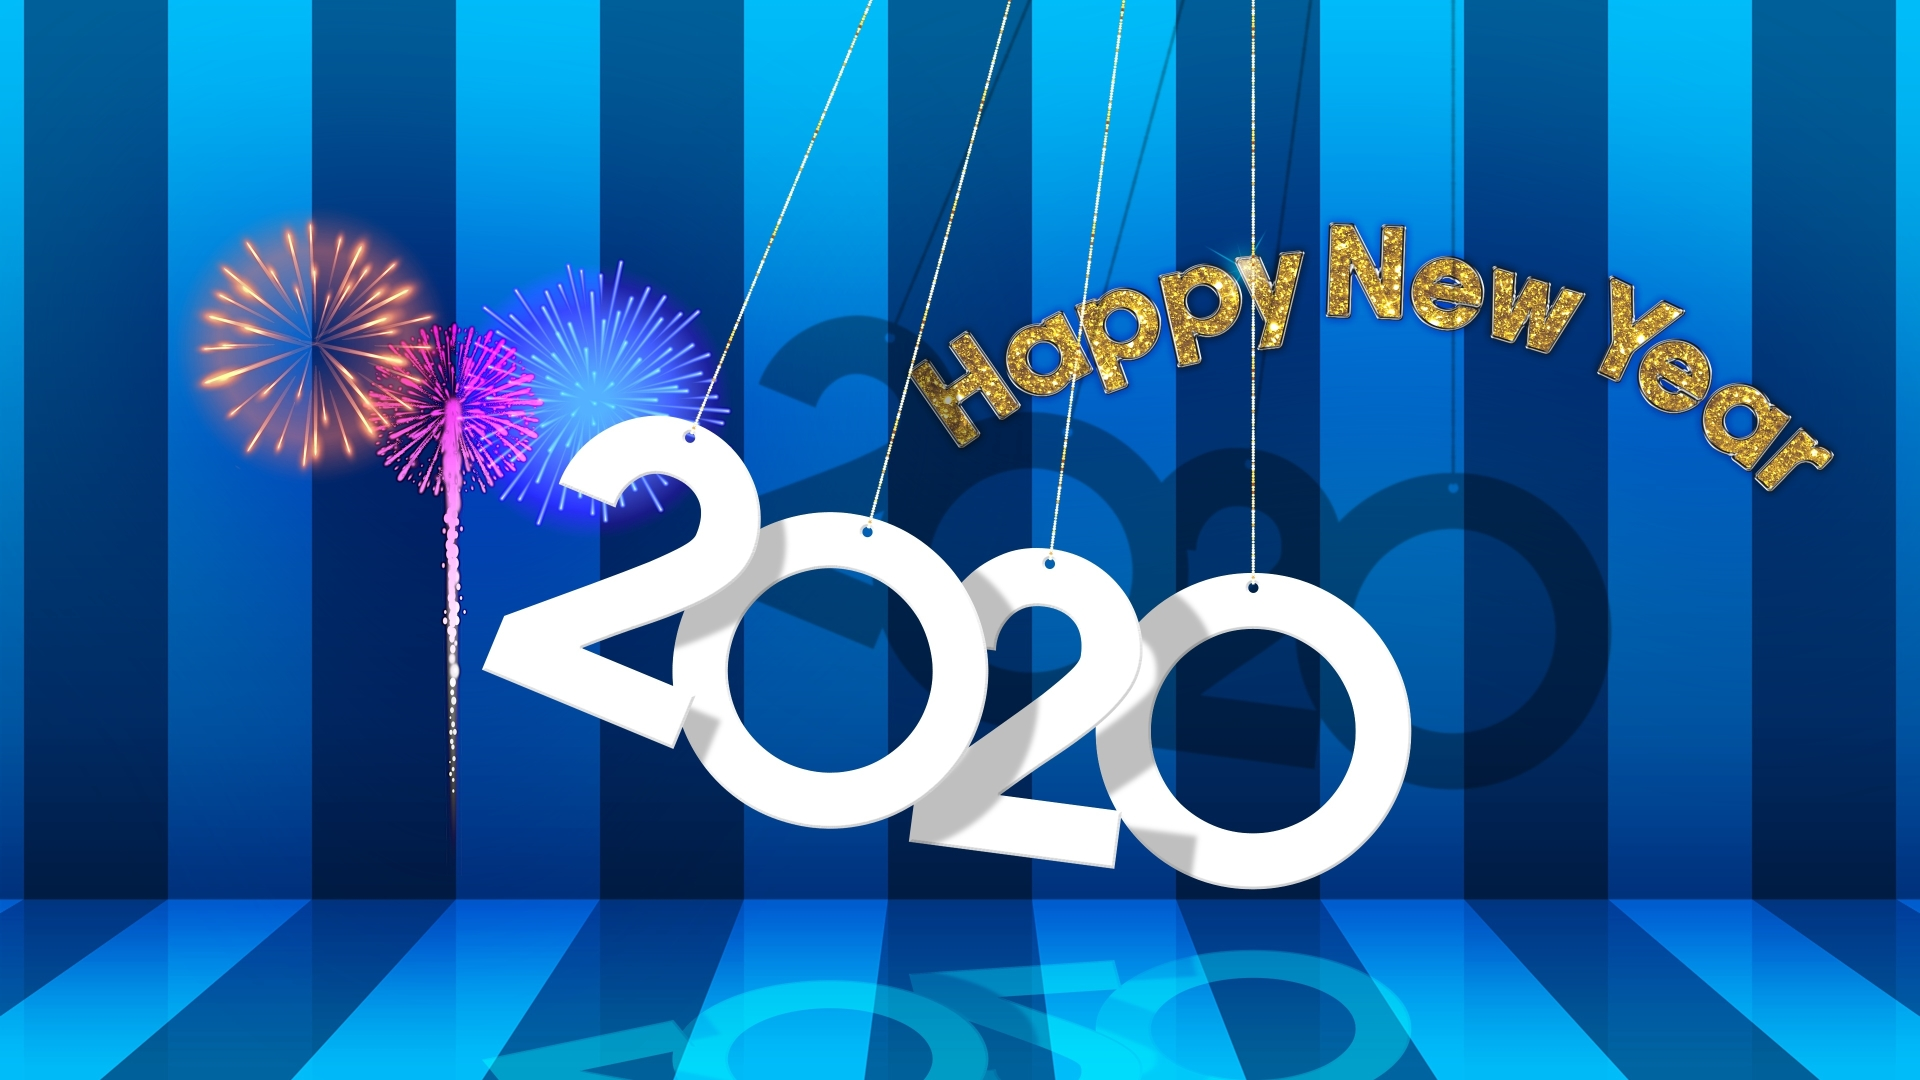 1920x1080 New Year 2020 1080P Laptop Full HD Wallpaper HD Other 1920x1080